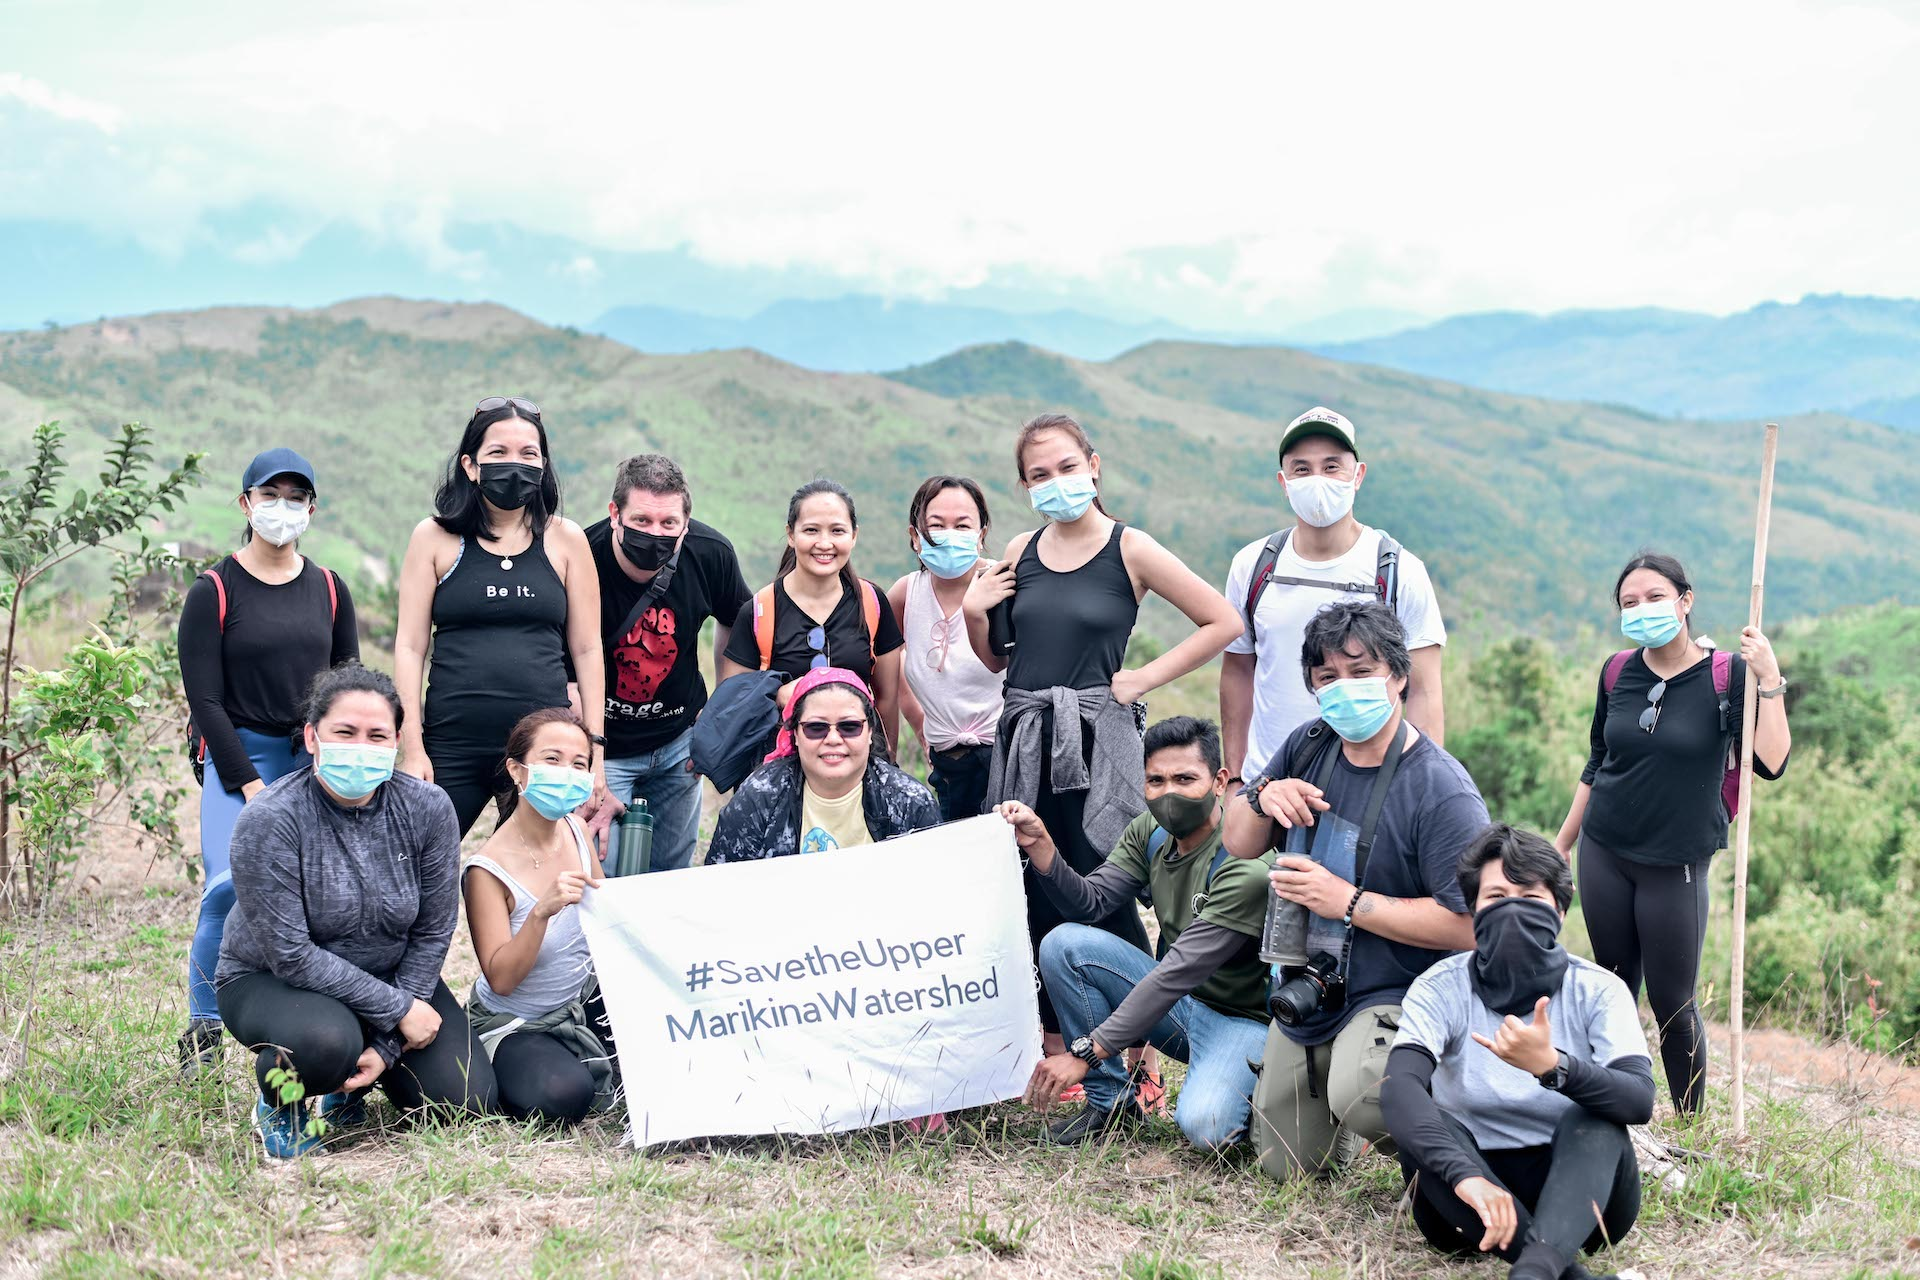 Masungi Georeserve conservation efforts to save the Upper Marikina Watershed